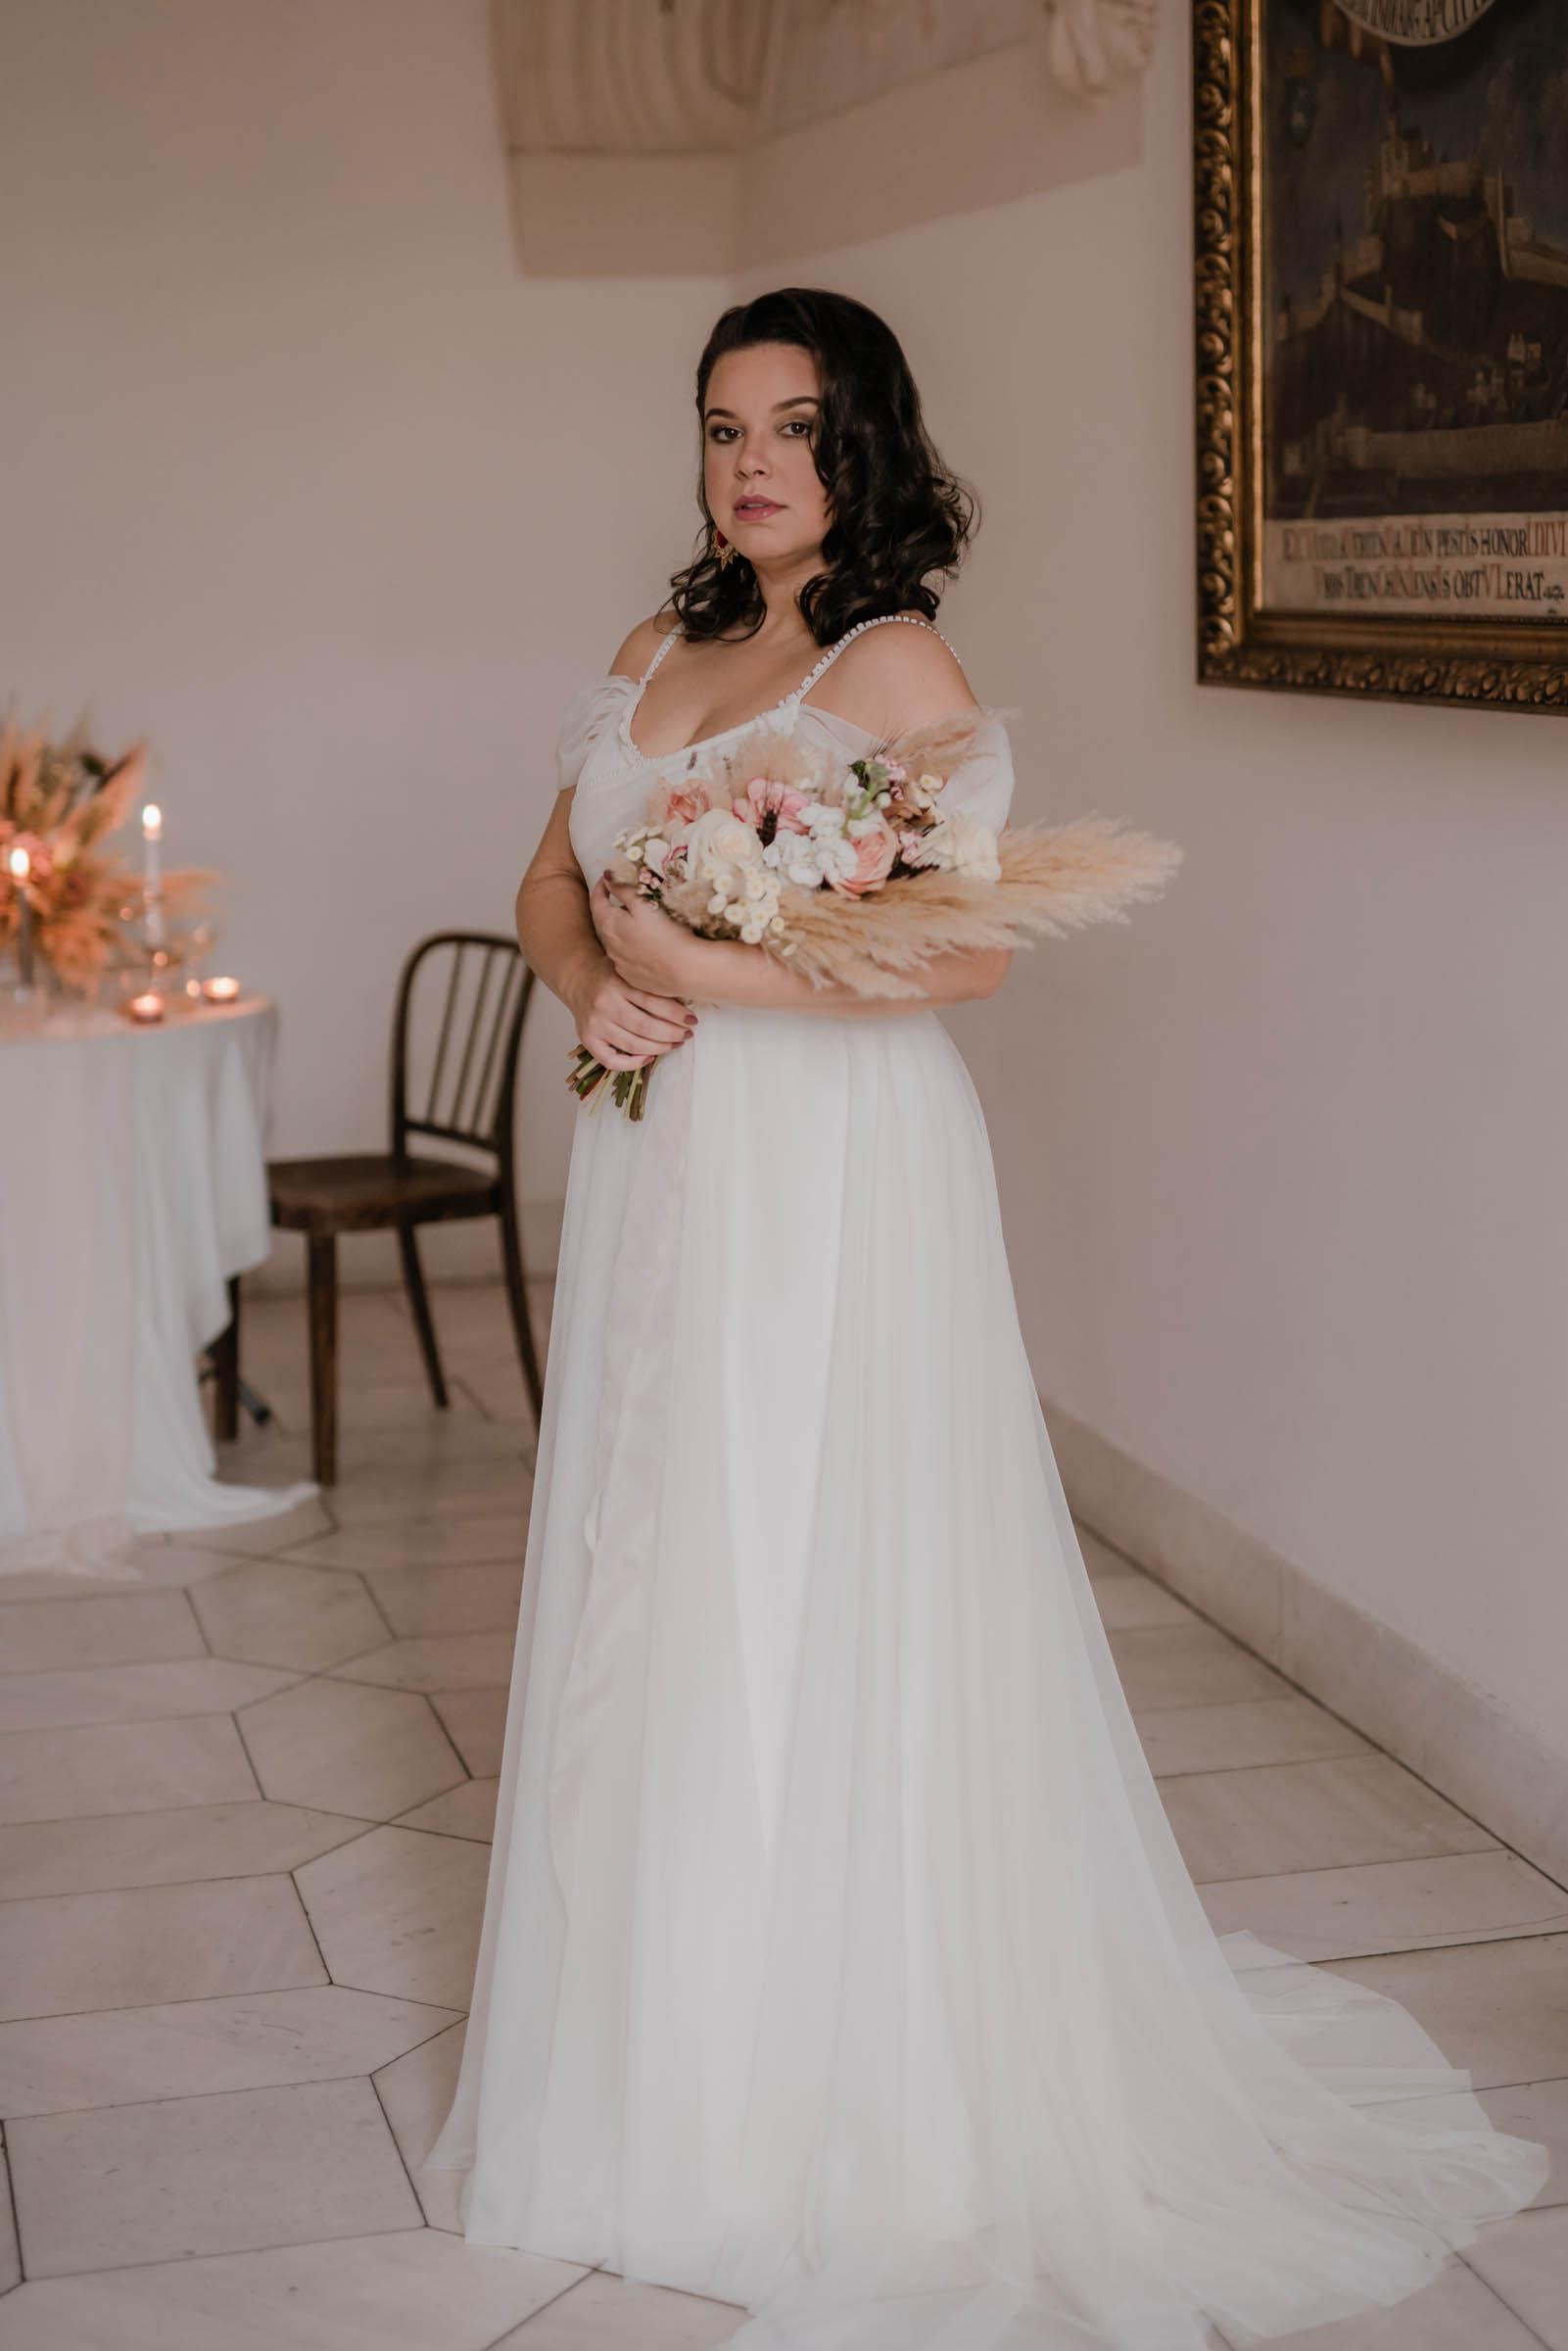 boho-svadobne-saty-veronika-kostkova-wedding-atelier-2019-tia-2